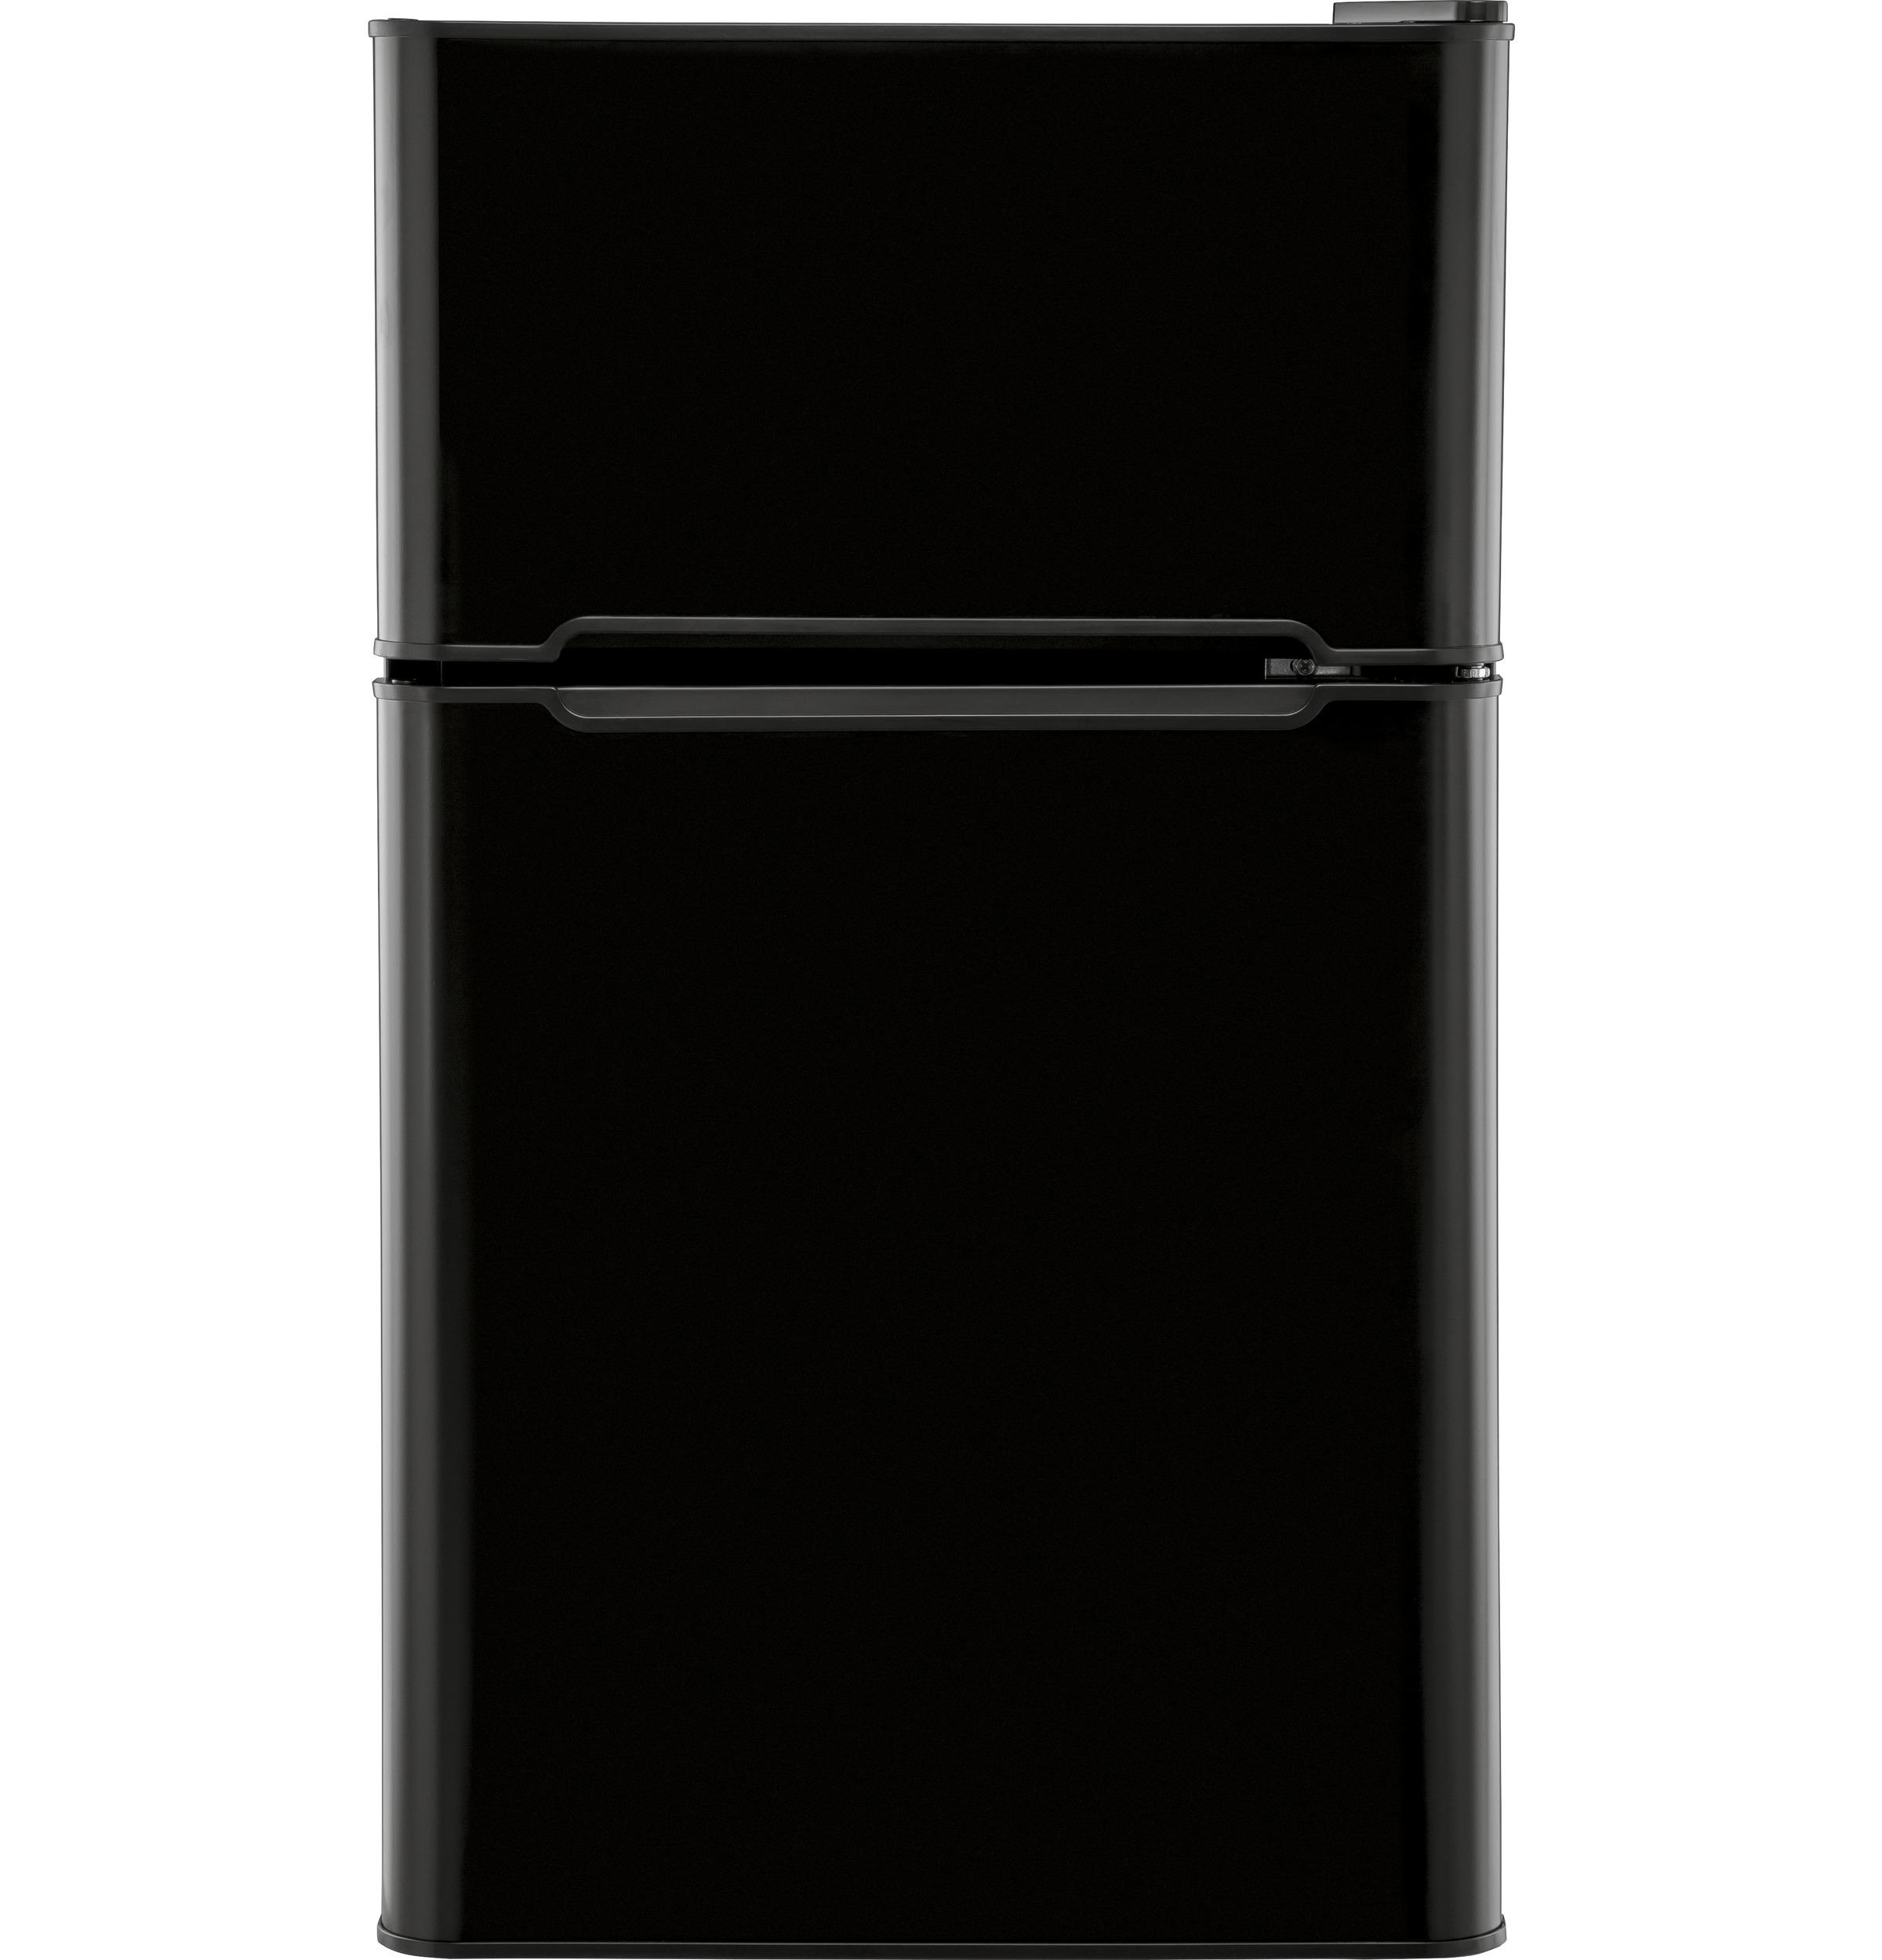 3.2 Cu. Ft. Compact Refrigerator